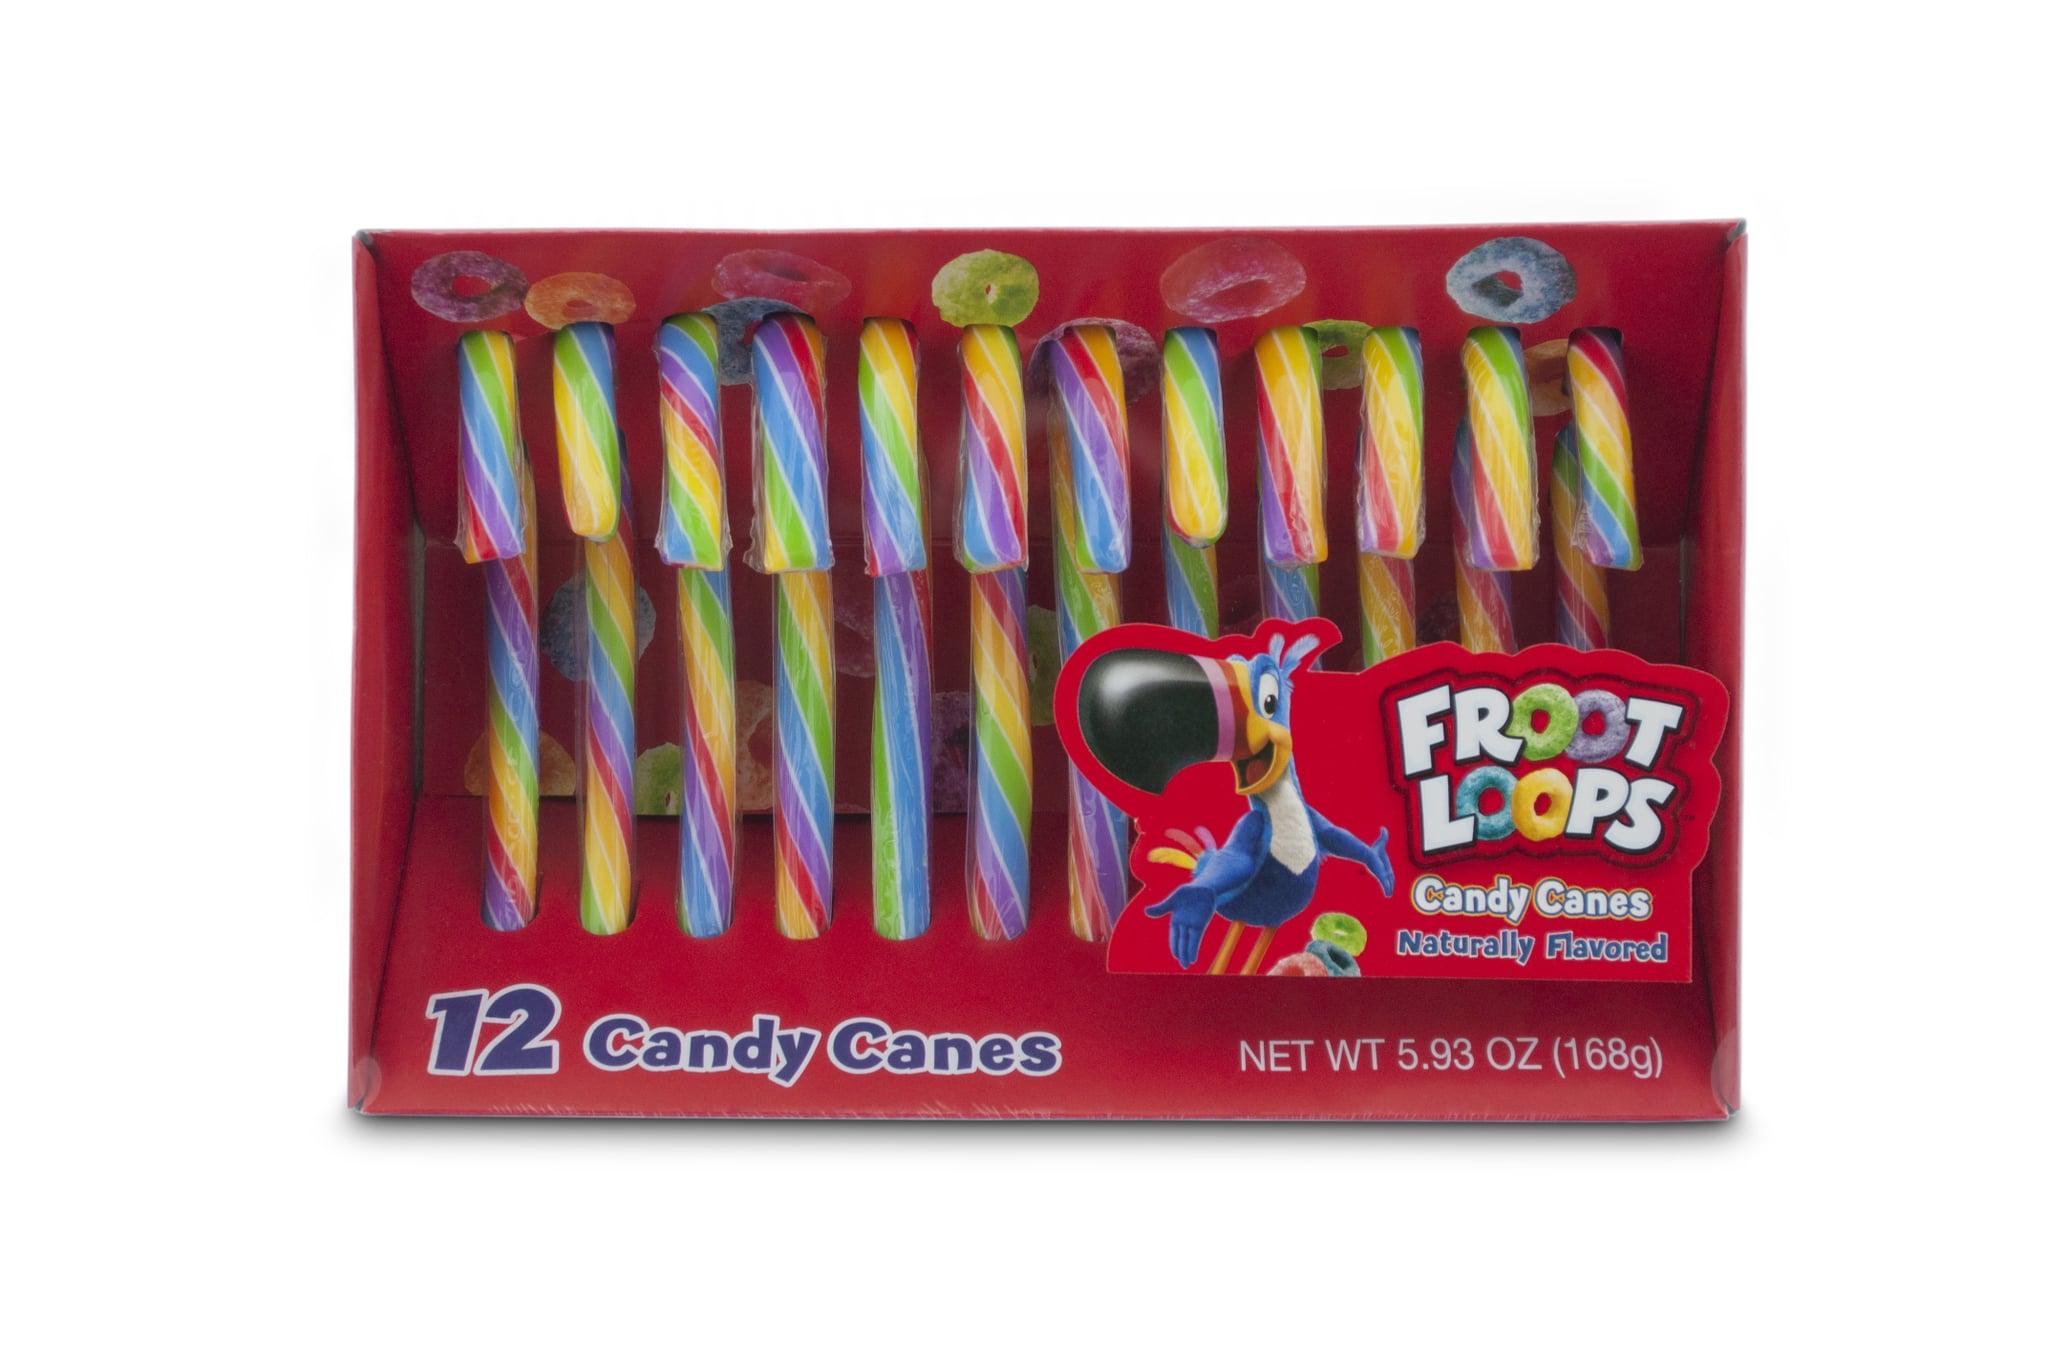 tmp_gflOb3_c97aea0b1e181b0b_Froot_Loops_Candy_Canes_-_Image_1.jpg